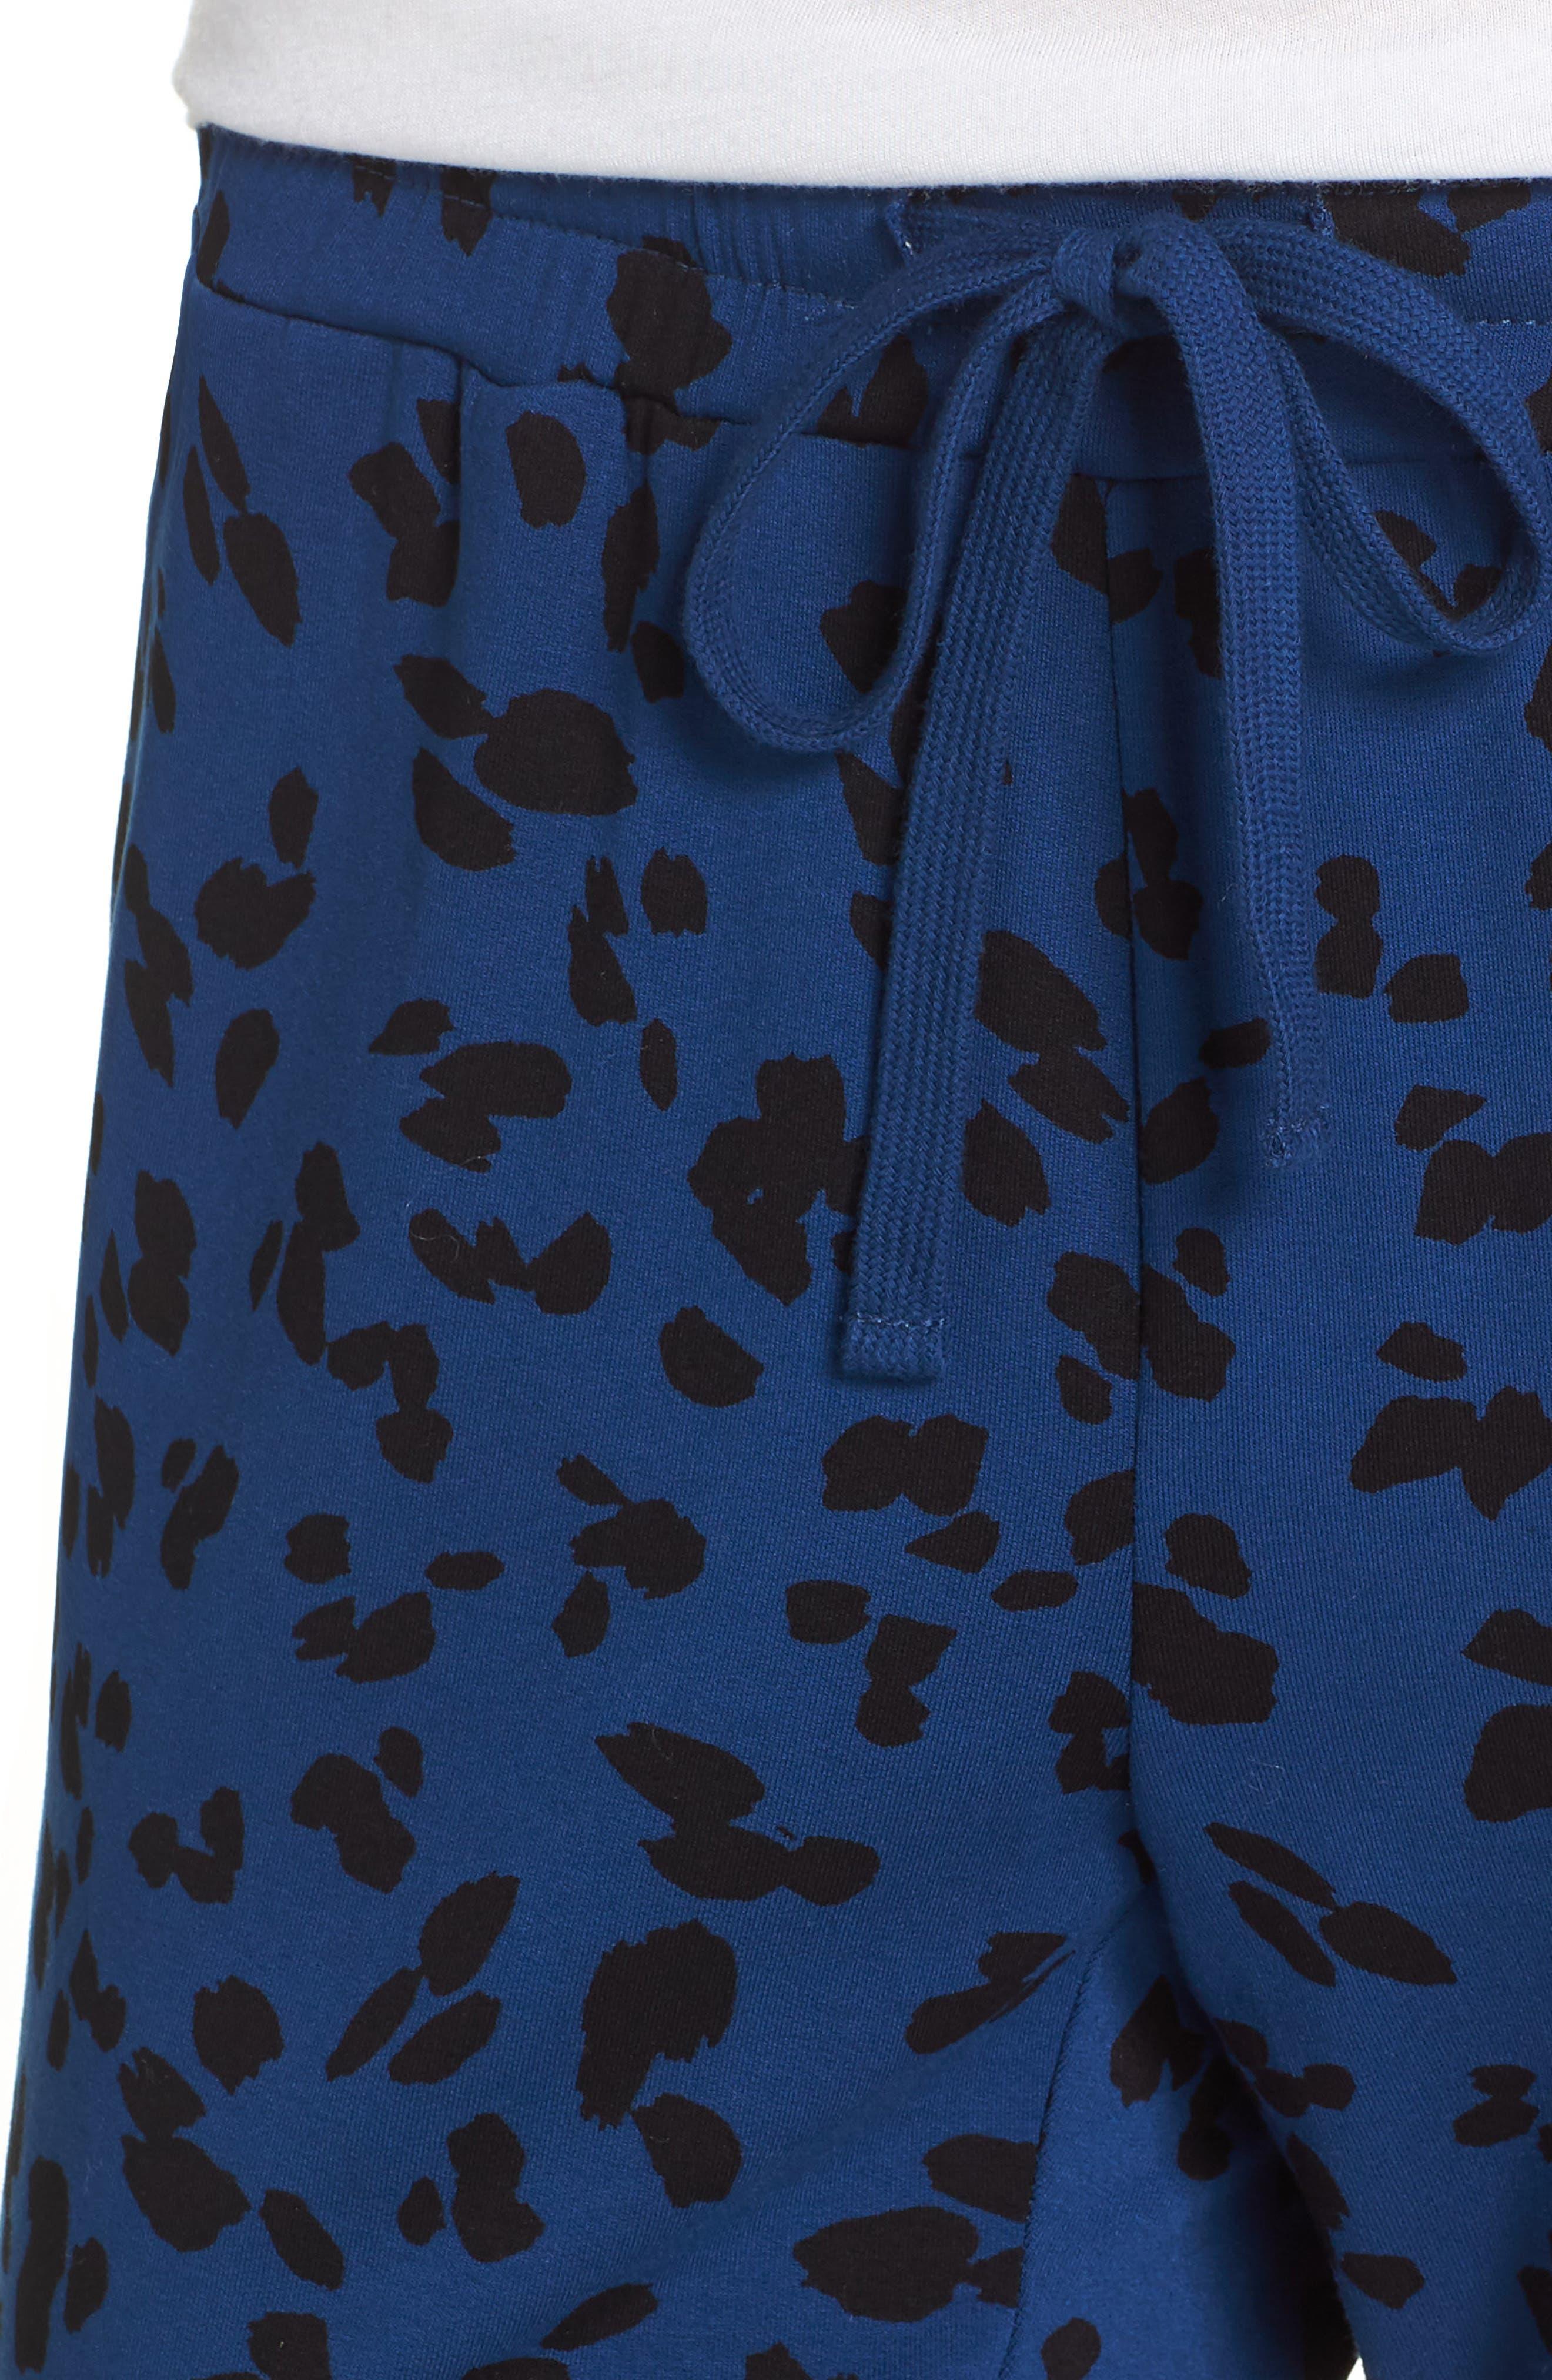 Totally Trending Leopard Print Jogger Pants,                             Alternate thumbnail 4, color,                             MARINE